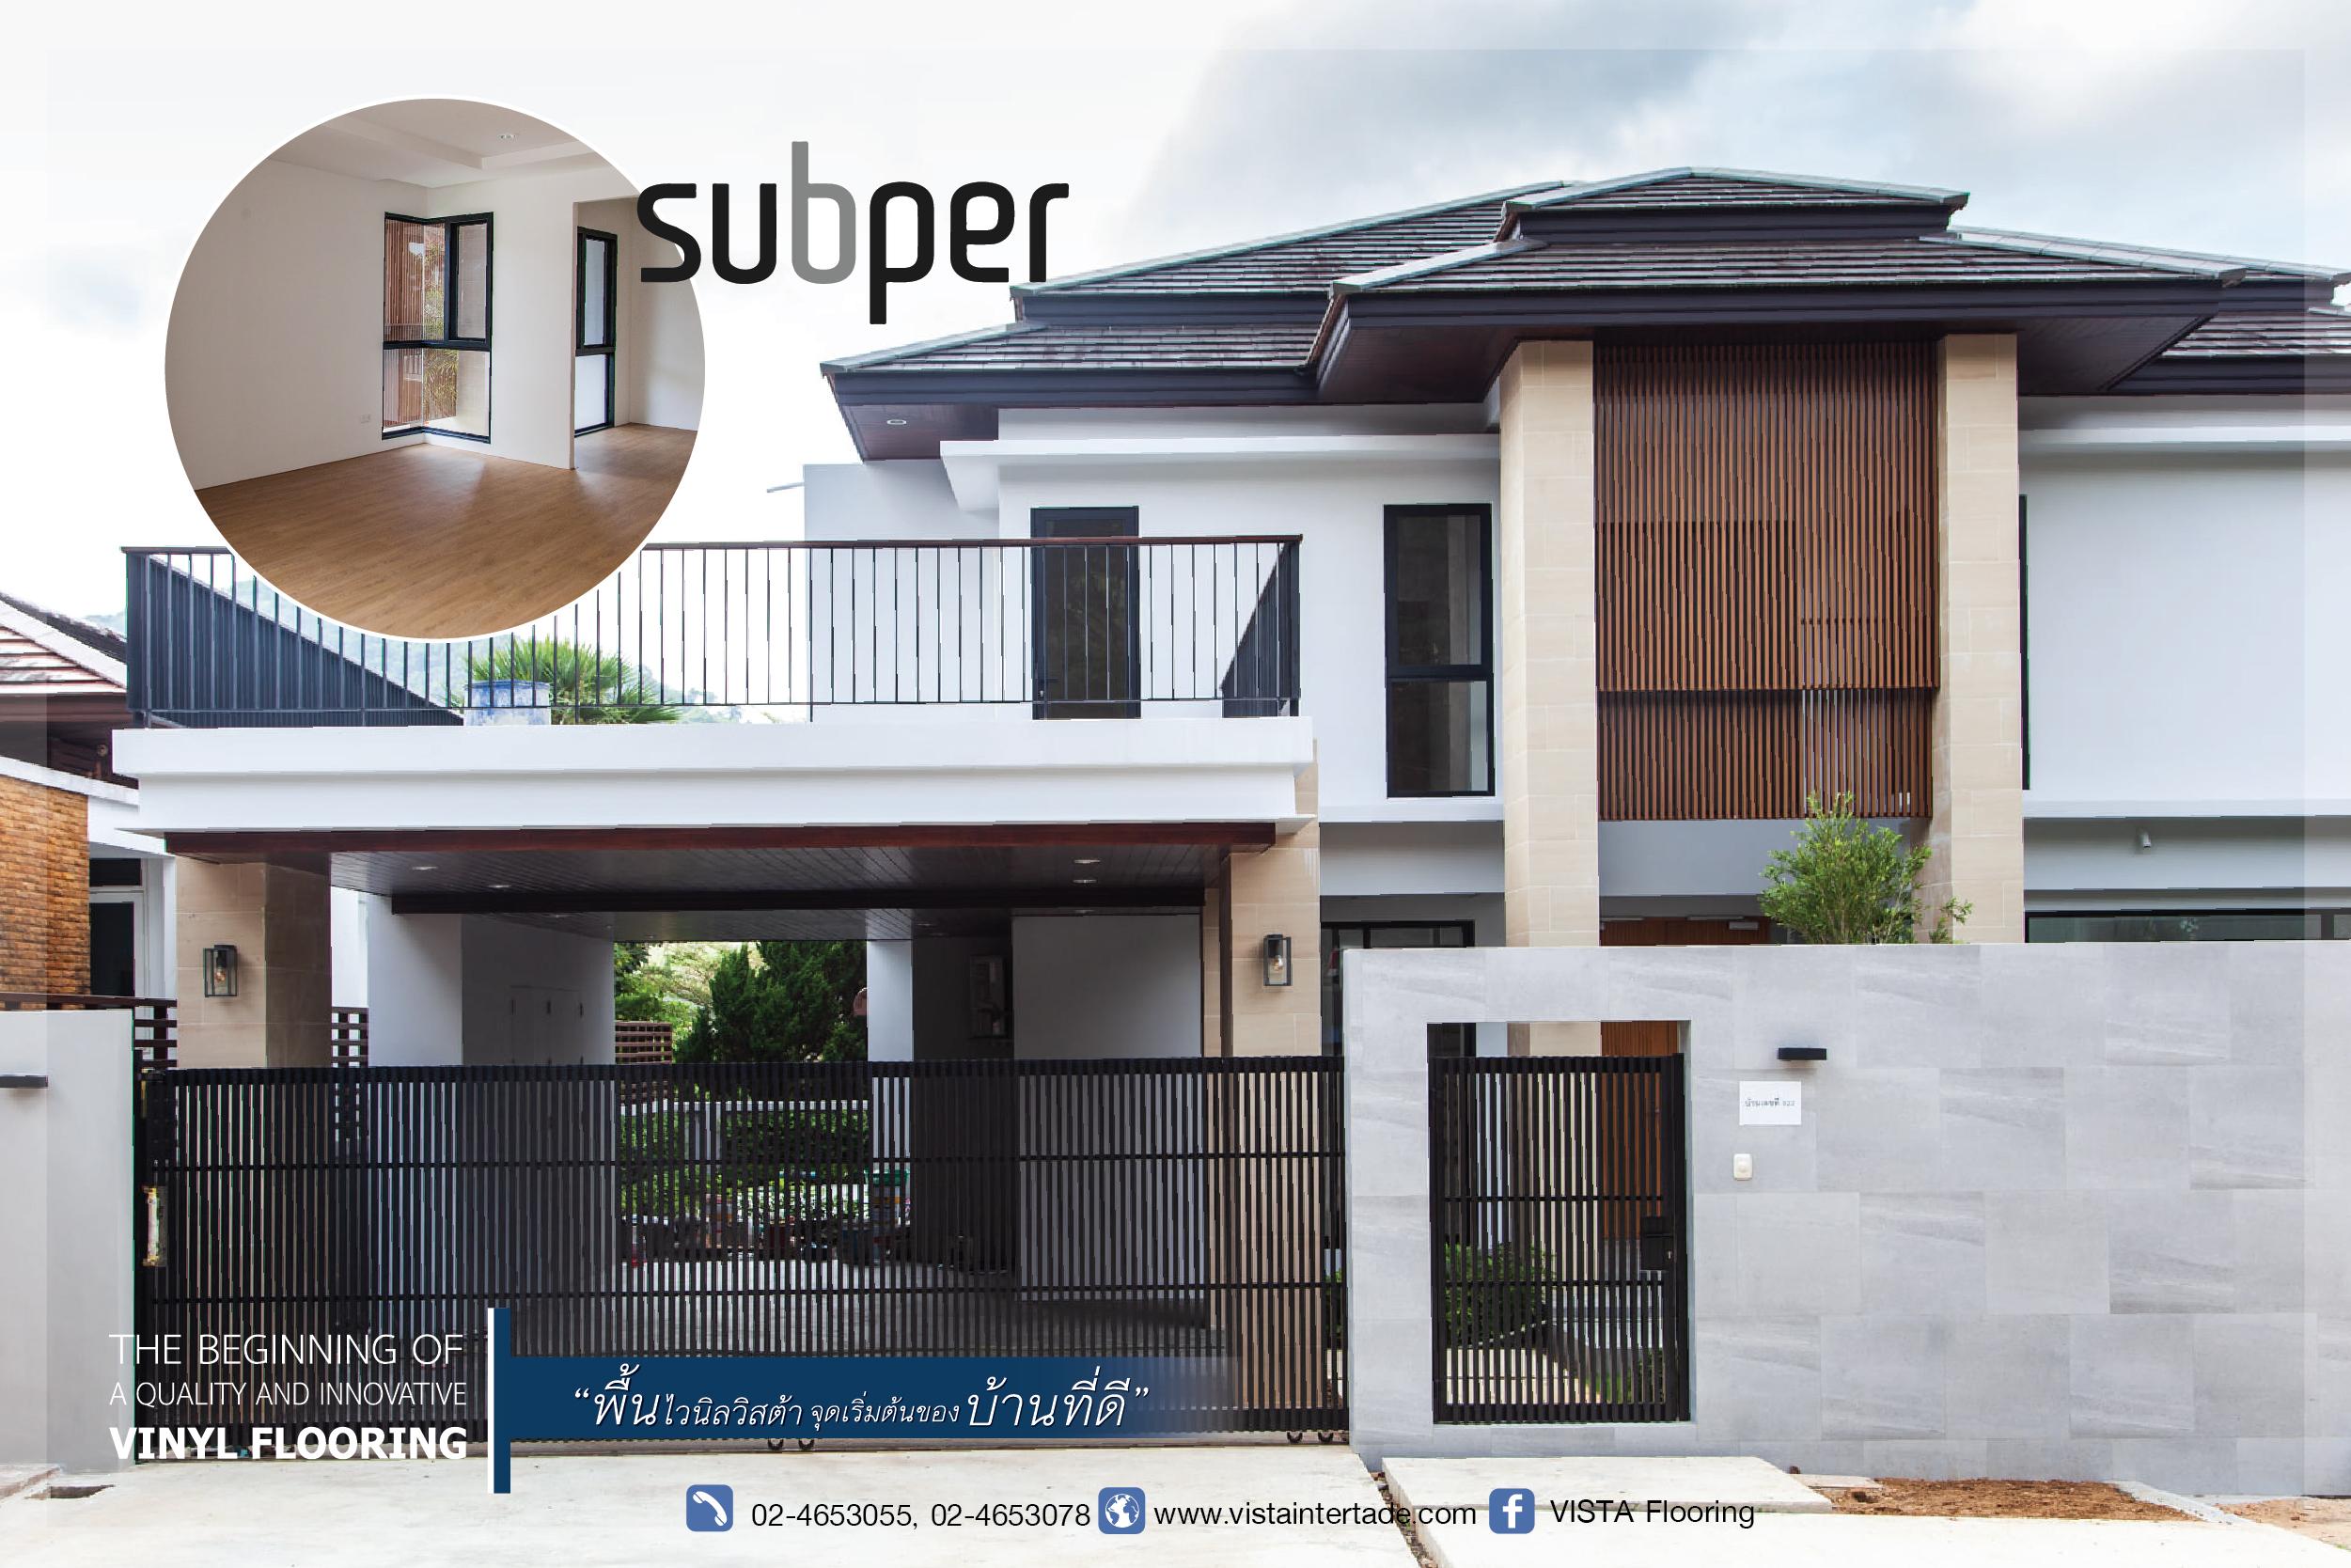 Subper